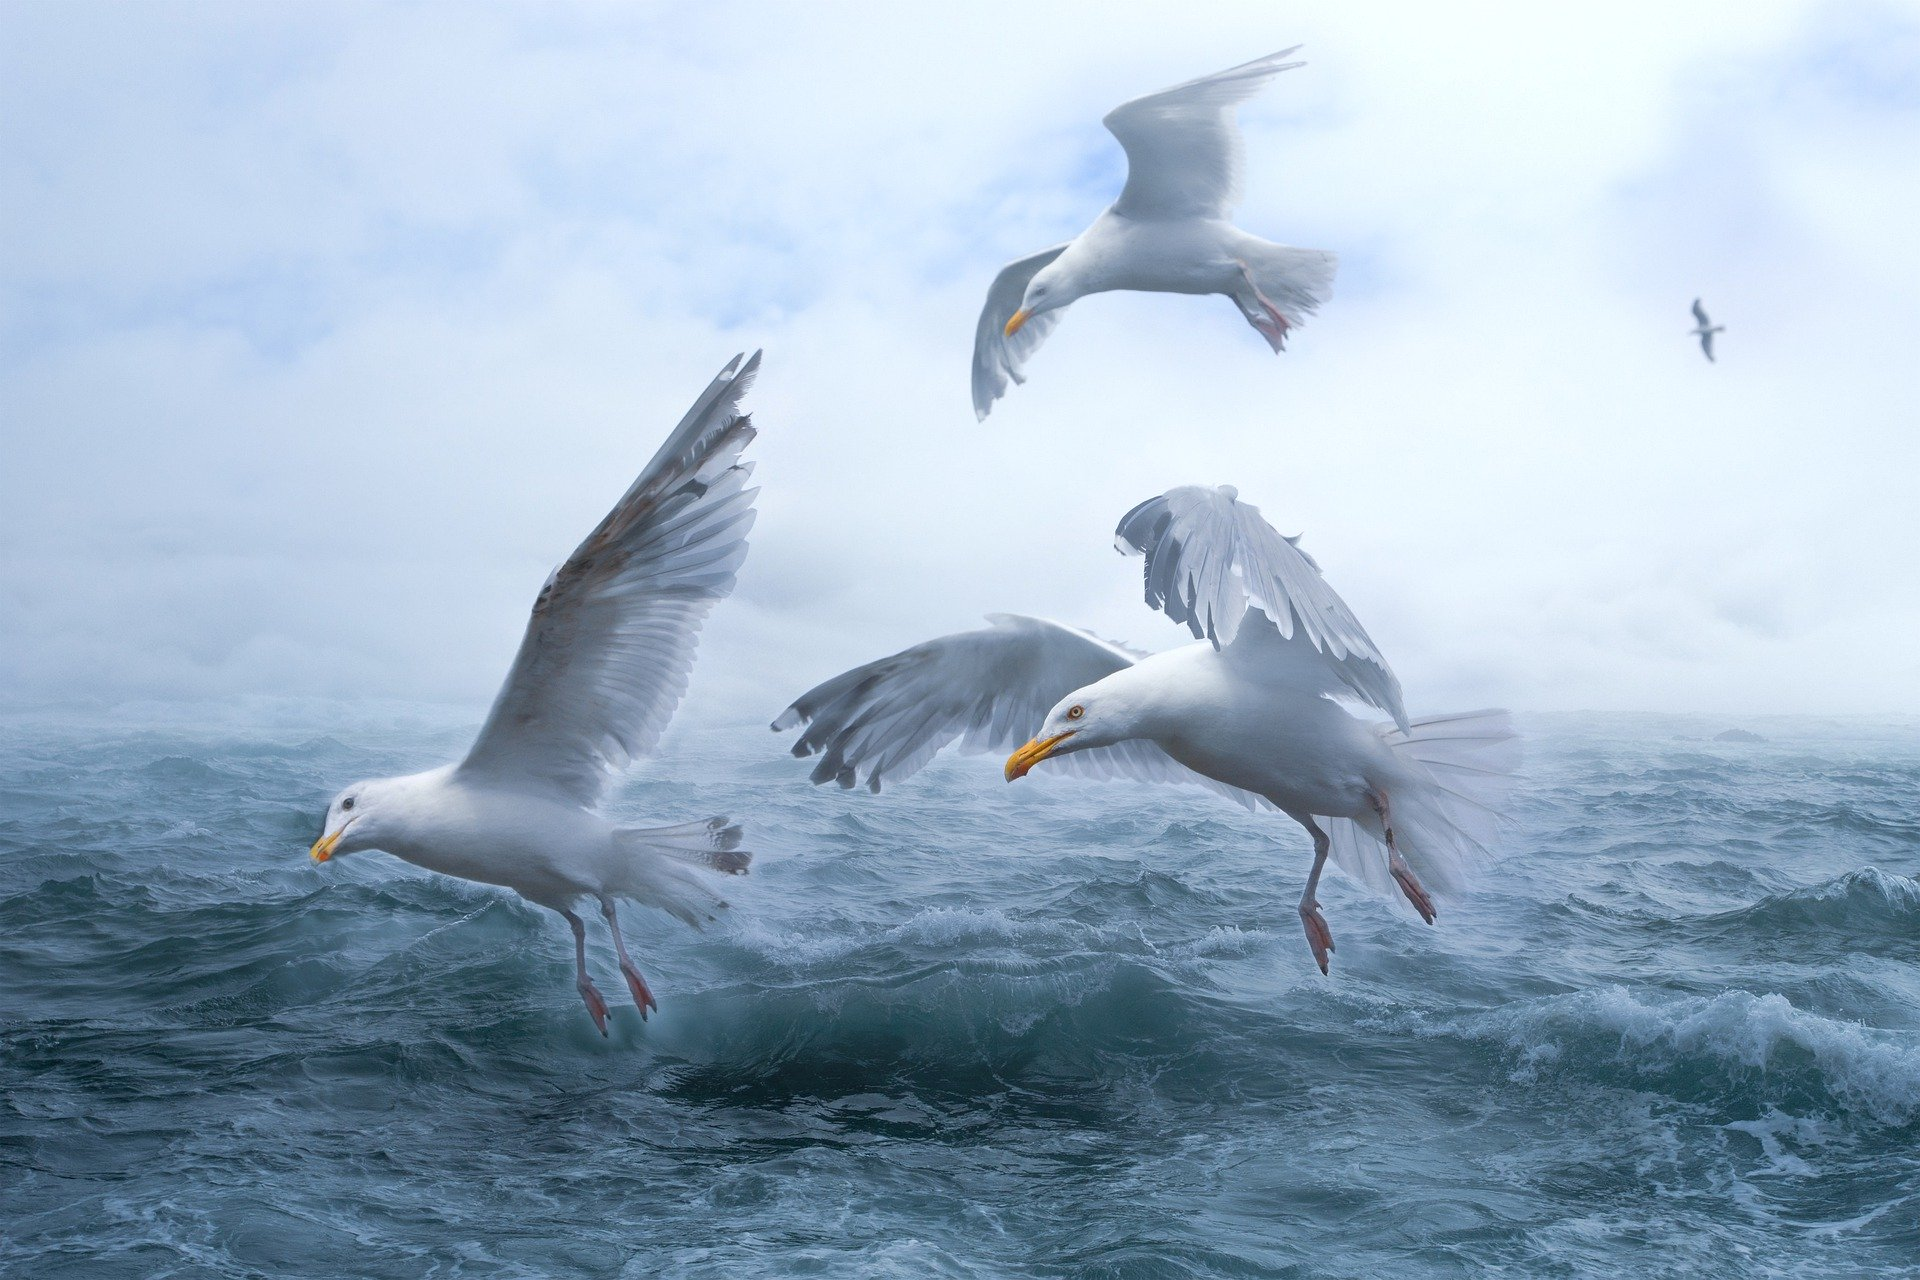 seagulls on the sea 1920x1280 - Free image bank